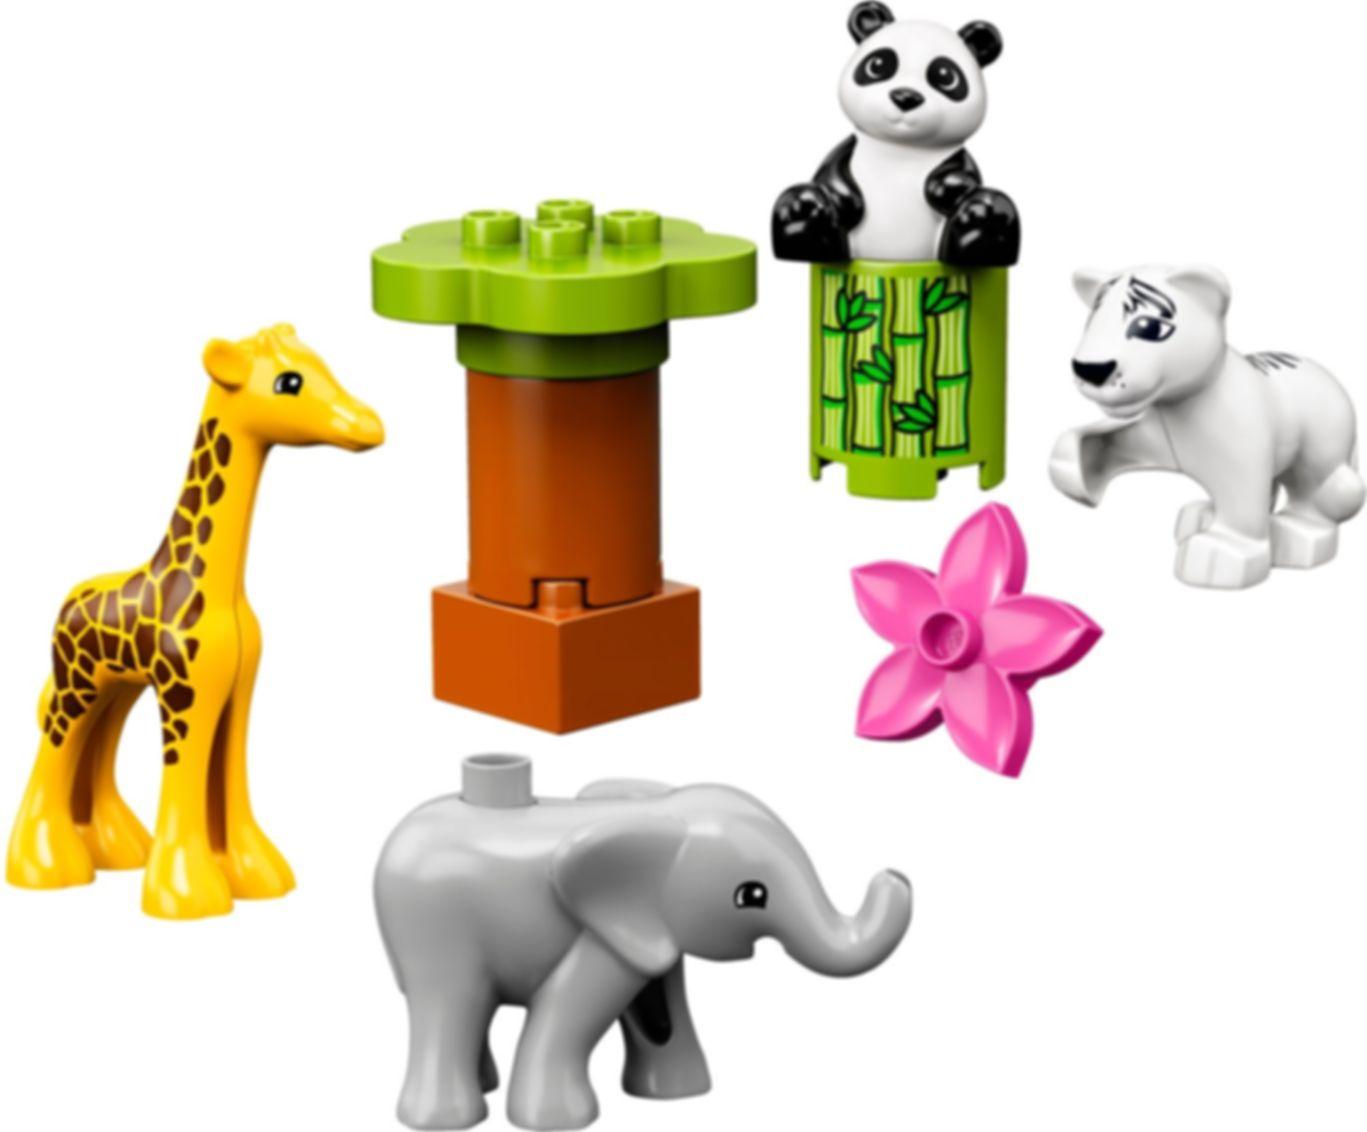 LEGO® DUPLO® Baby Animals components